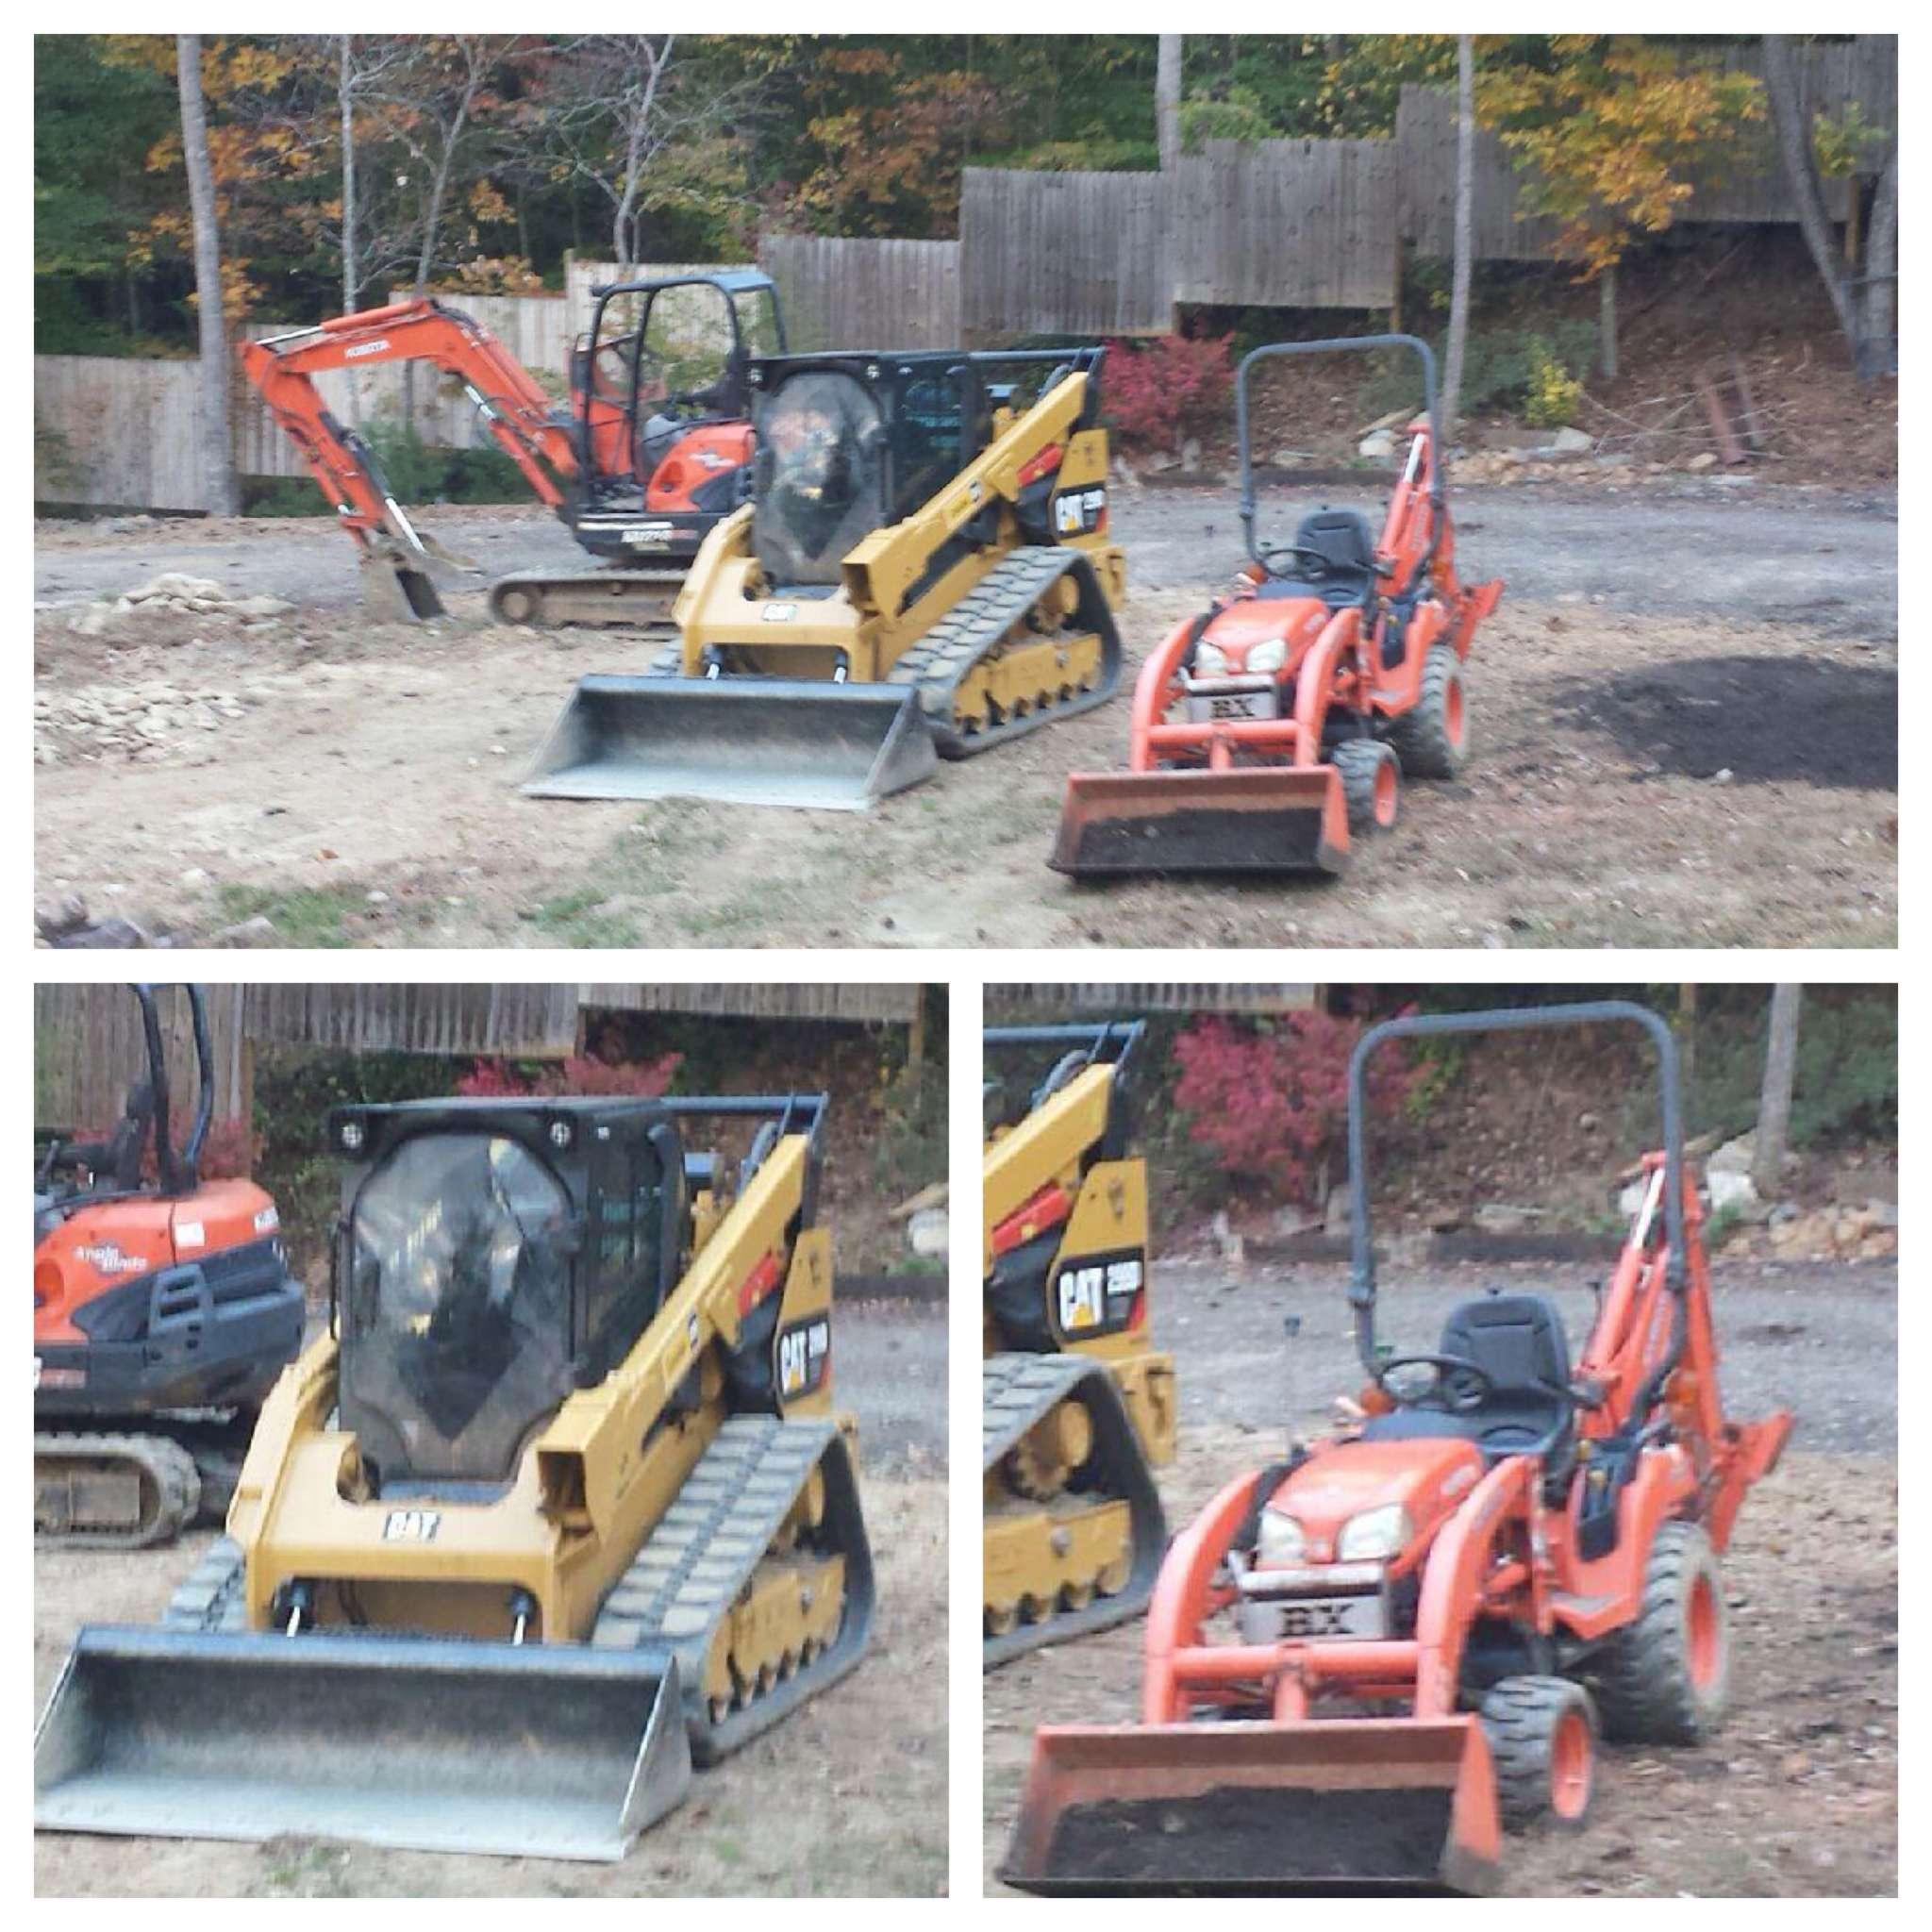 Excavation & Grading Equipment-Lawn-N-Order Landscaping